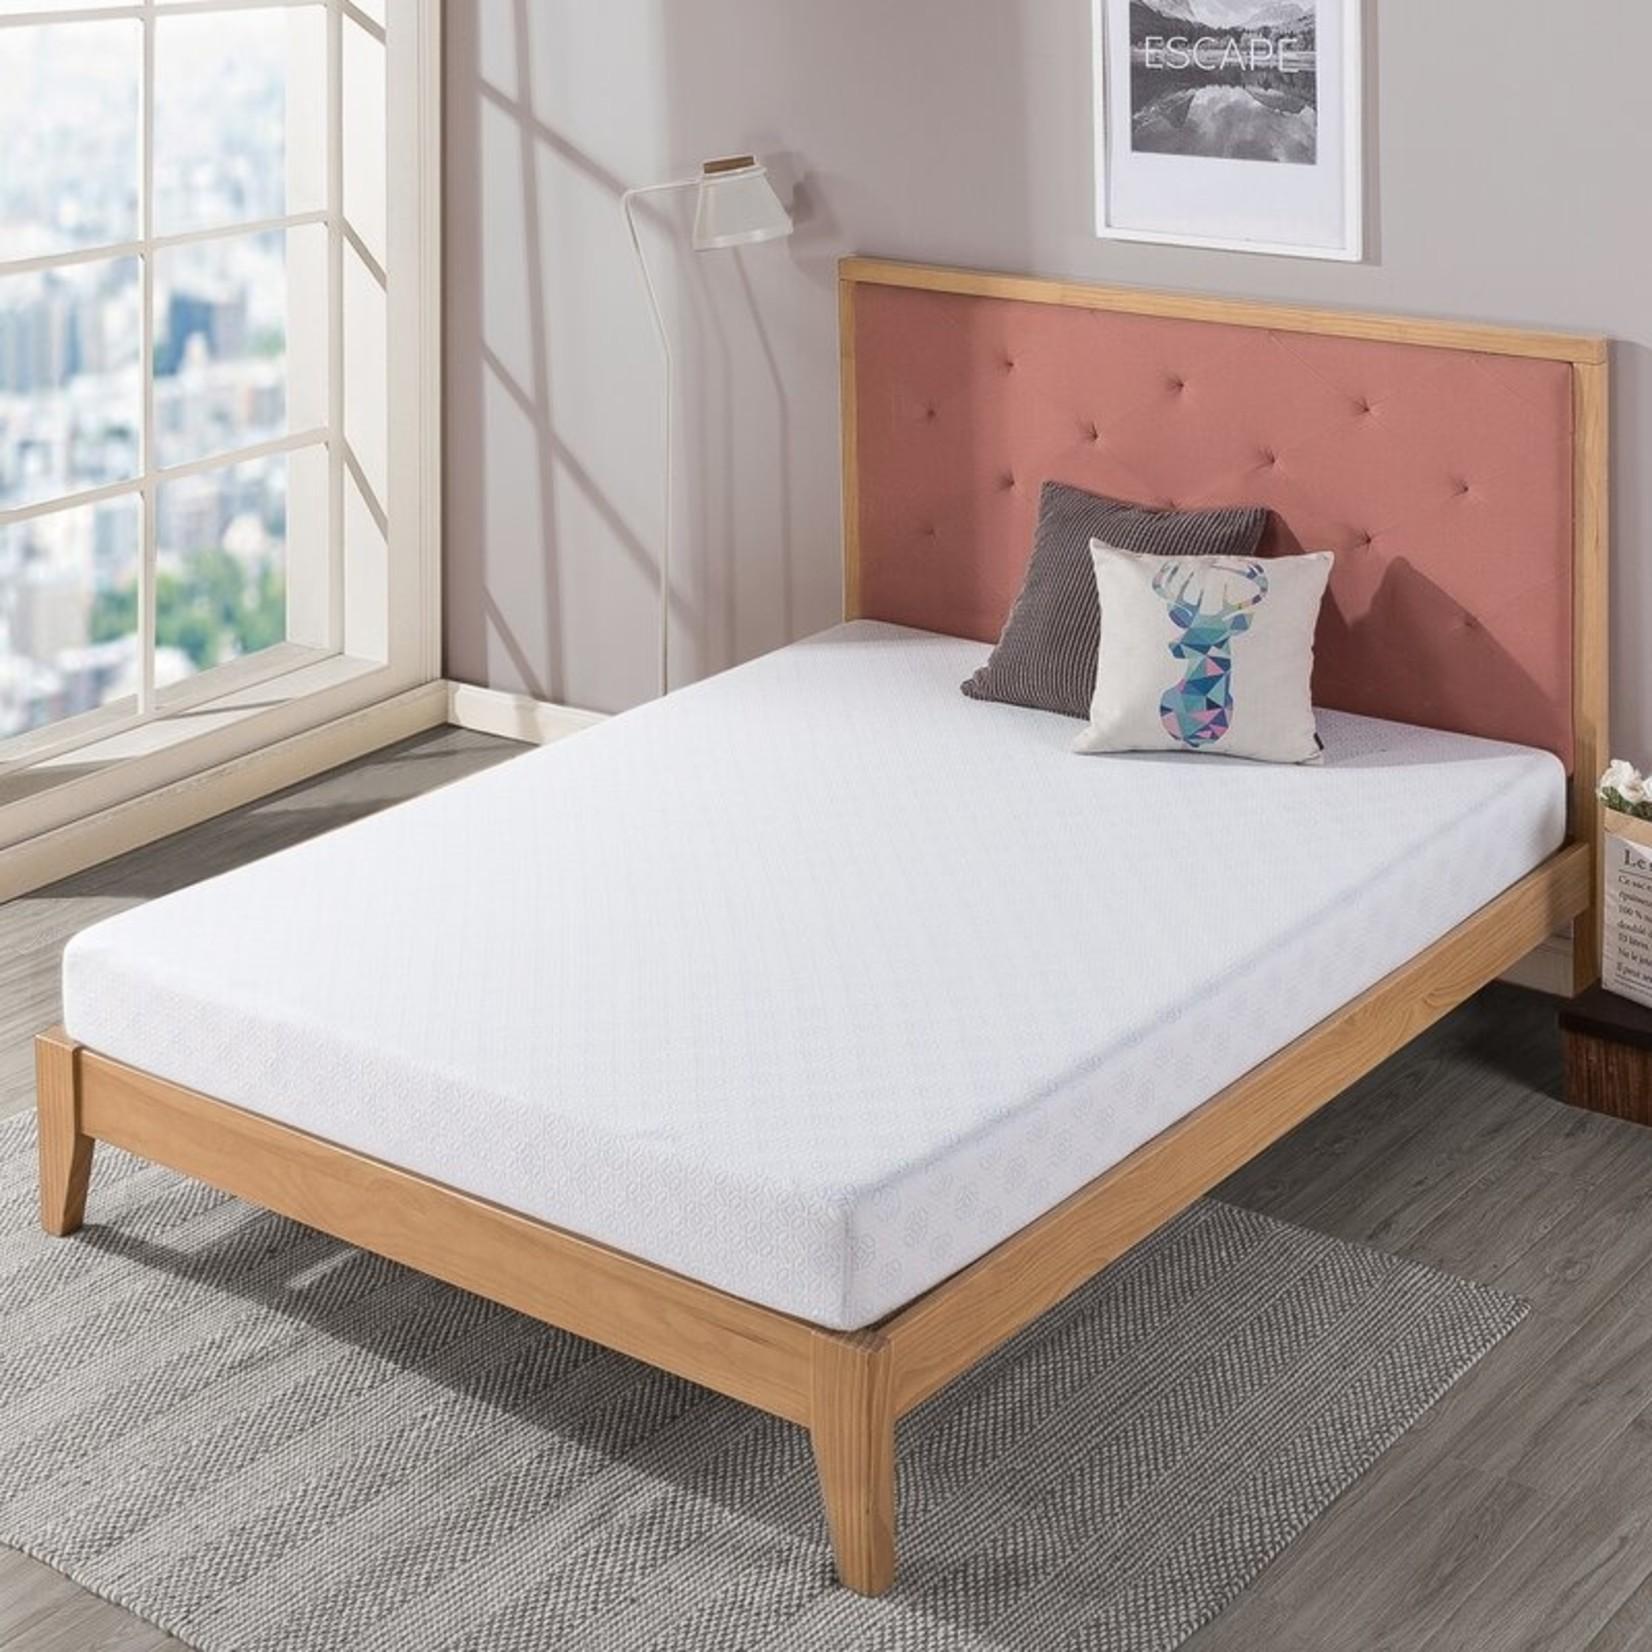 "*Full - Wayfair Sleep Medium 8"" Gel Memory Foam Mattress - Final Sale"